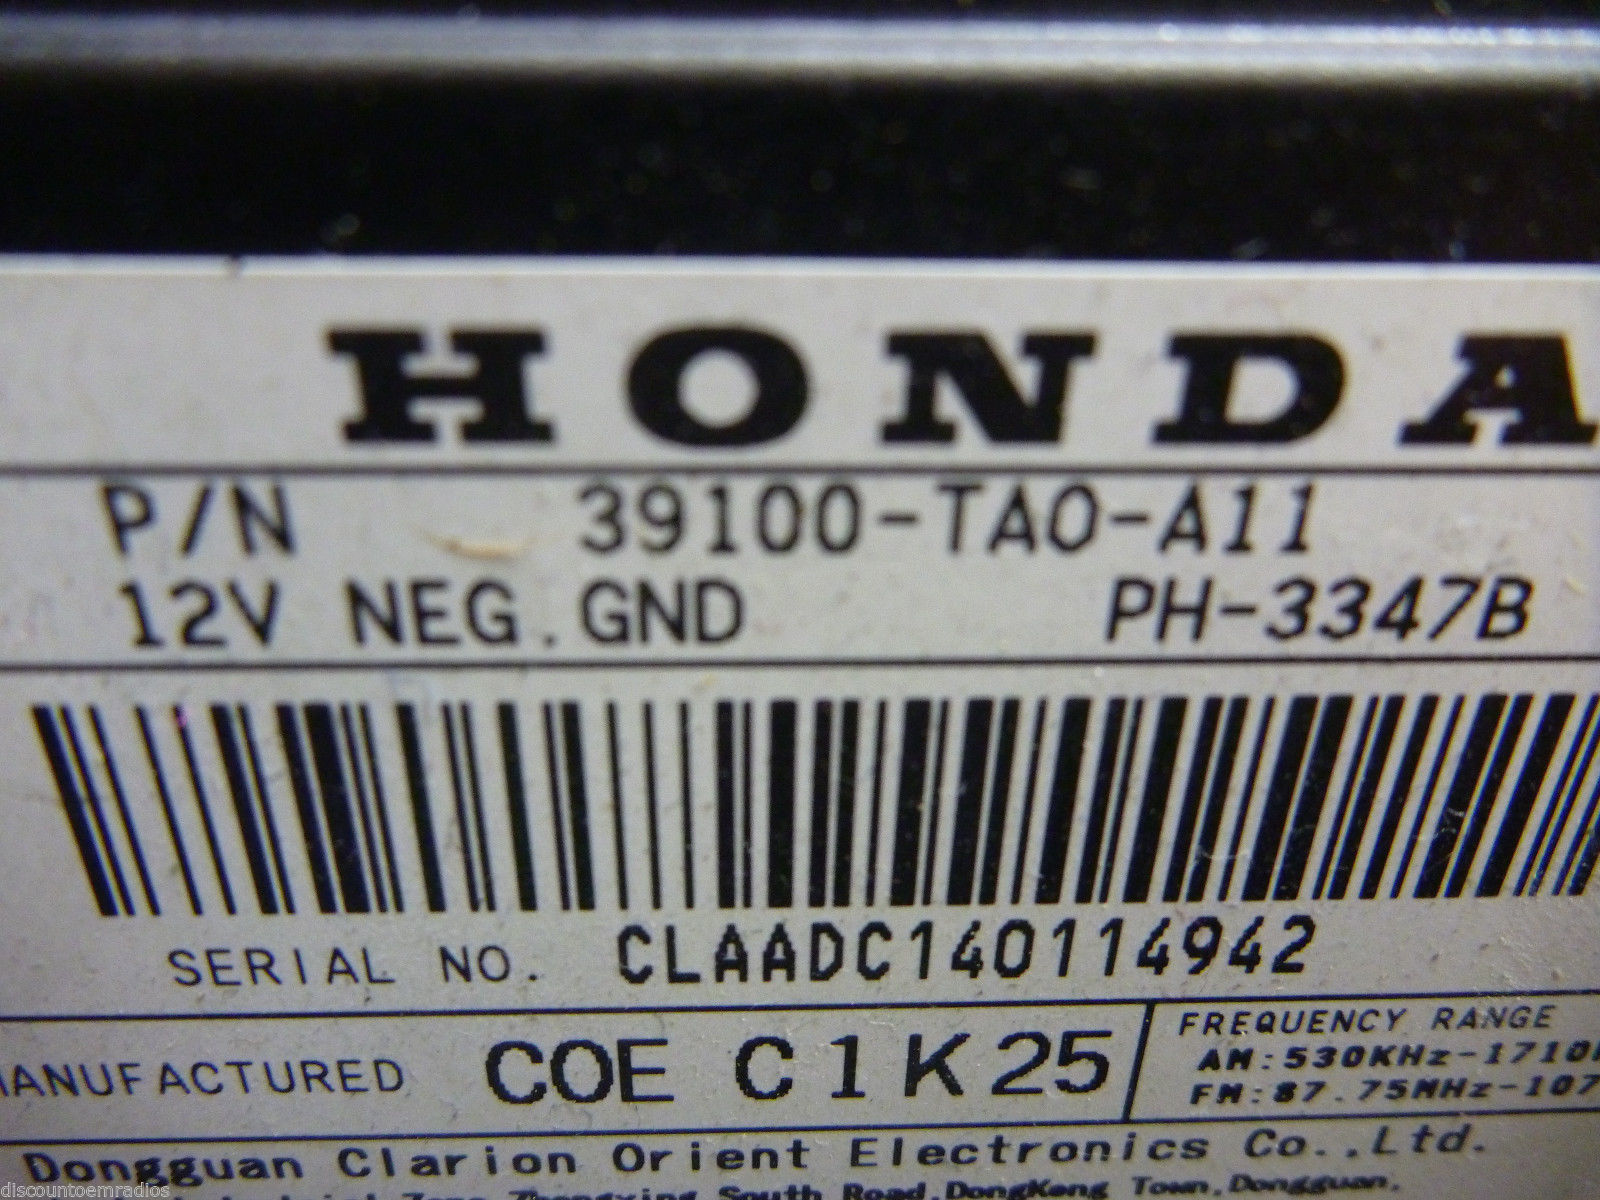 08 09 10 11 12 Honda Accord AMFM Radio Cd MP3 Player 4BA2 39100-TA0-A11 C54342